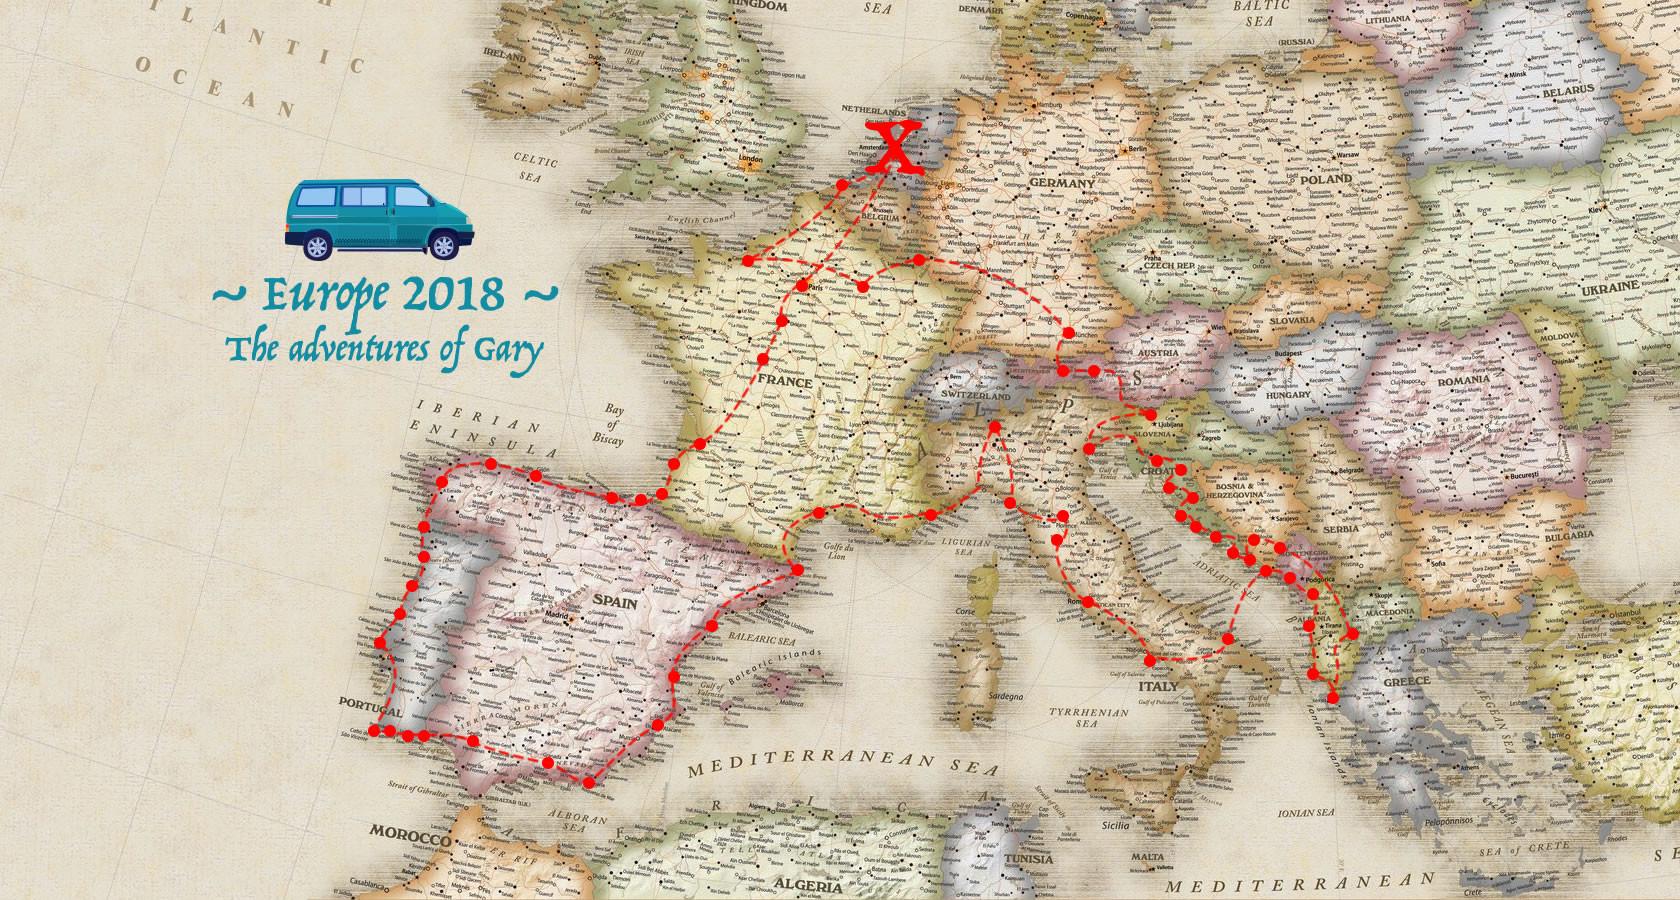 Europe 2018 Trip